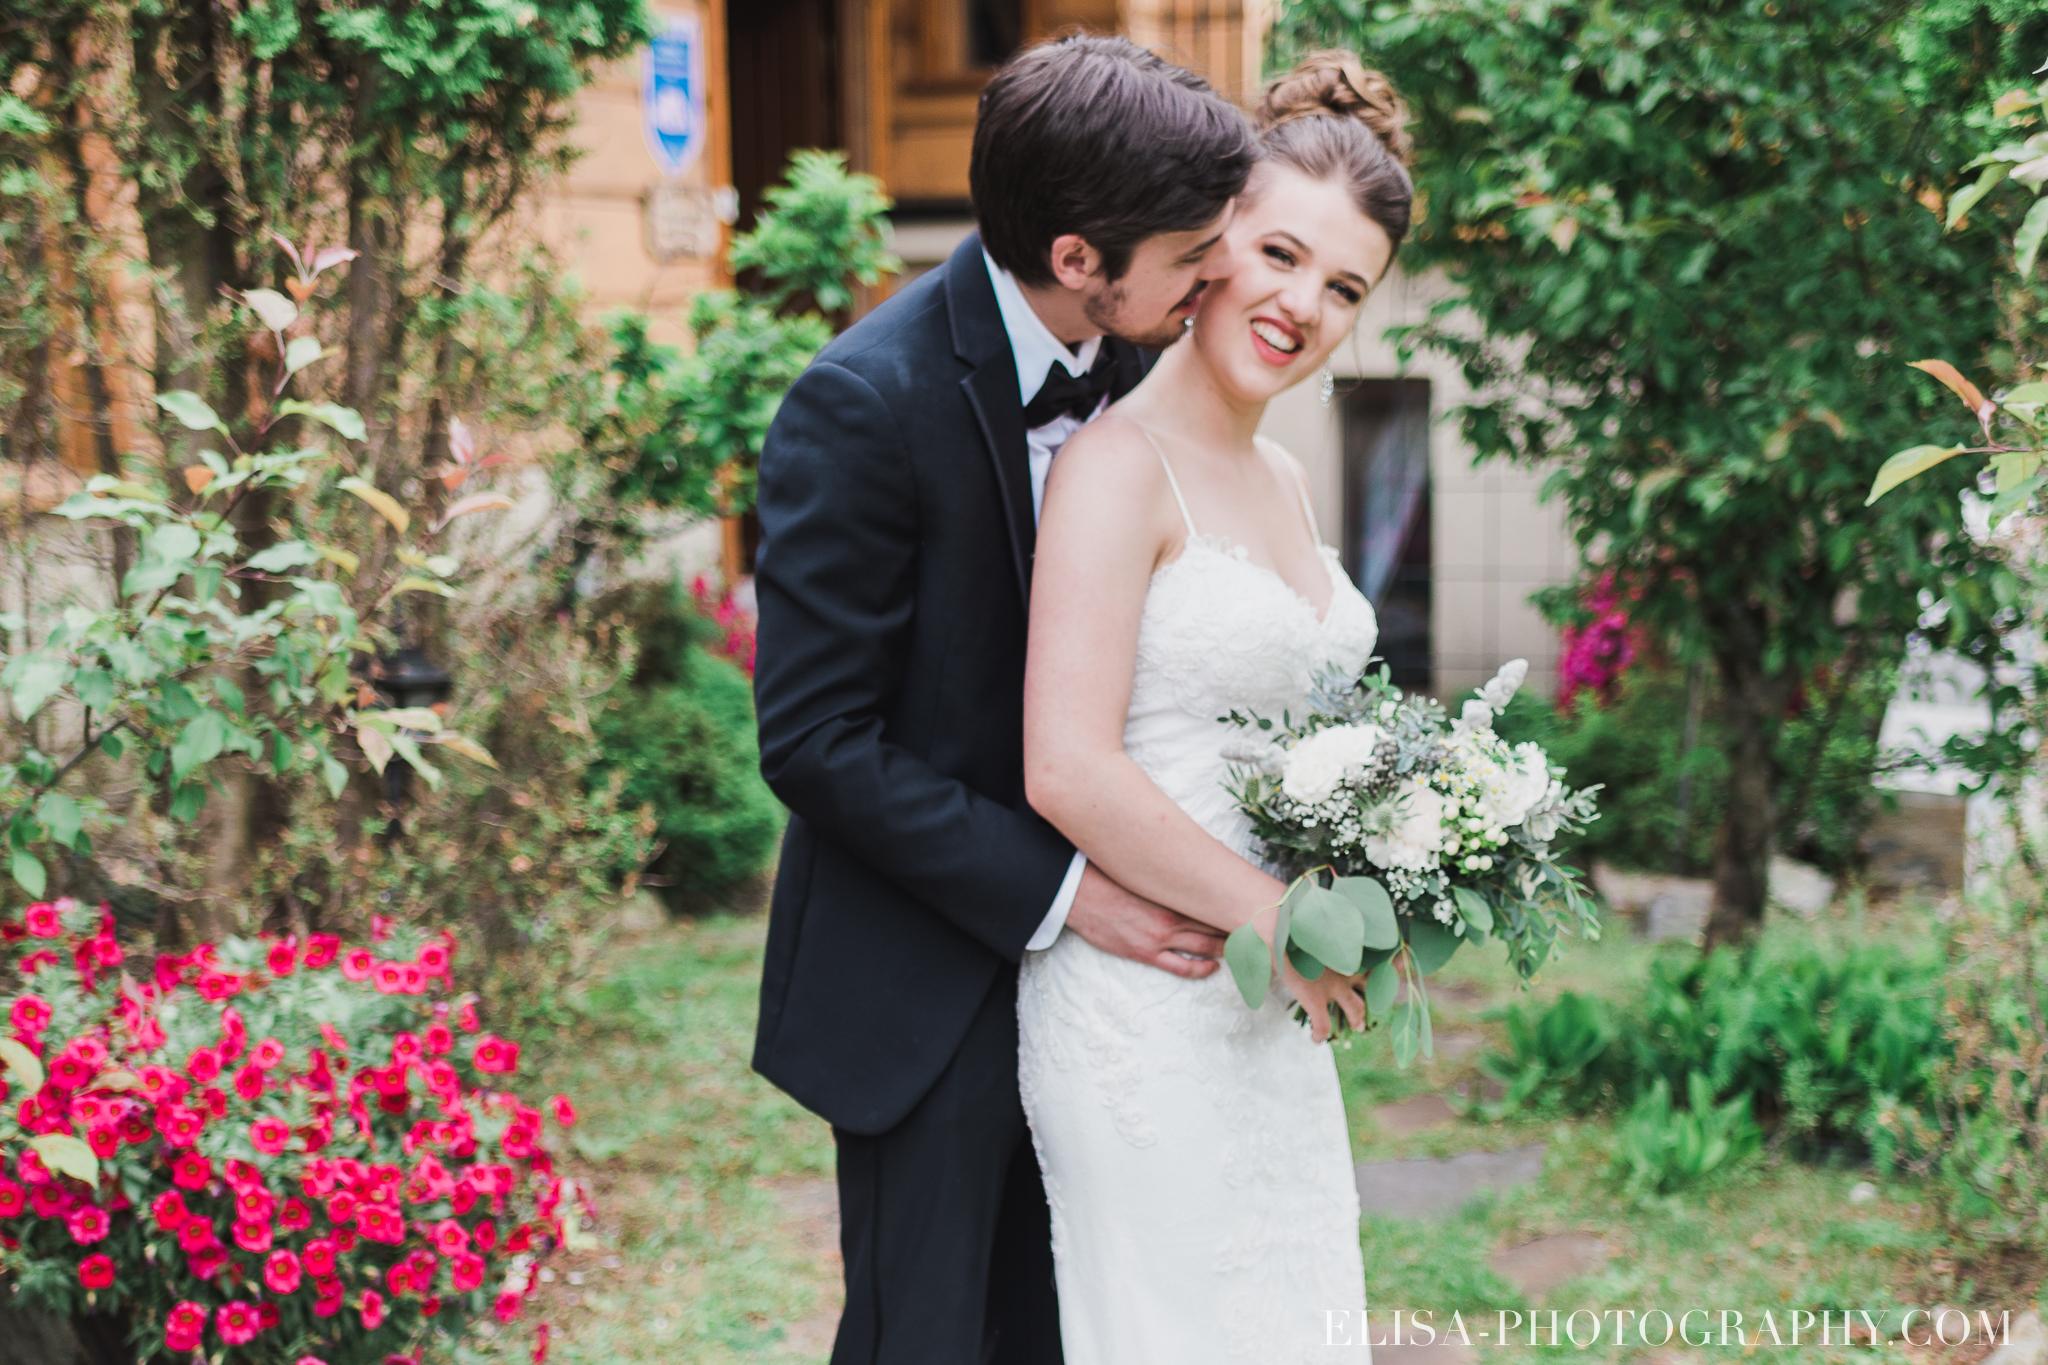 photo mariage a la montagne domaine tomali maniatin portrait couple lifestyle naturel lumineux professionel 6332 - Mariage à la montagne au domaine Tomali-Maniatyn